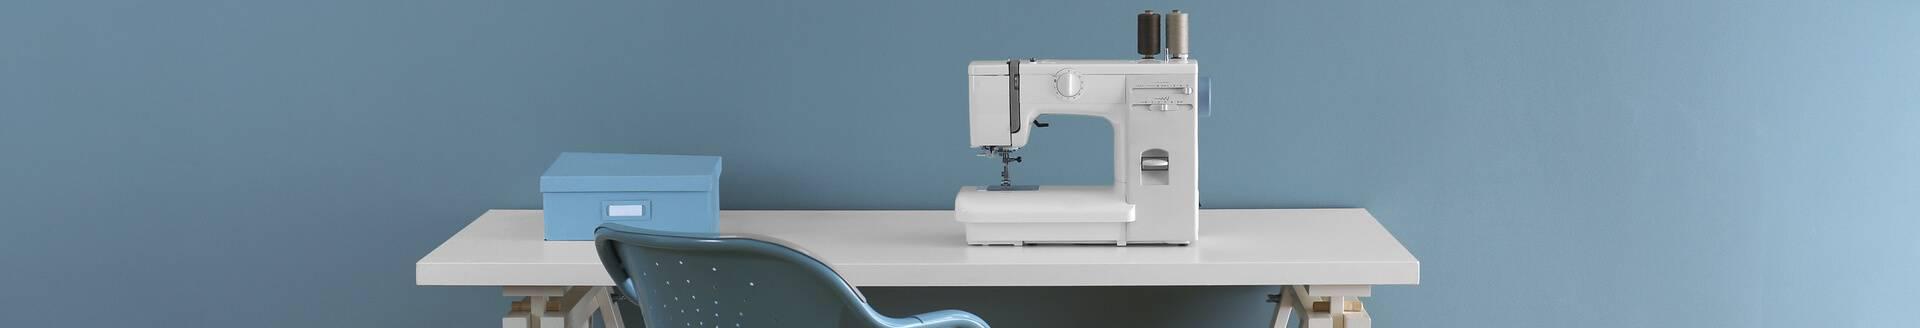 Venta de máquinas de coser domésticas JUKI, PFAFF; GRITZNER...